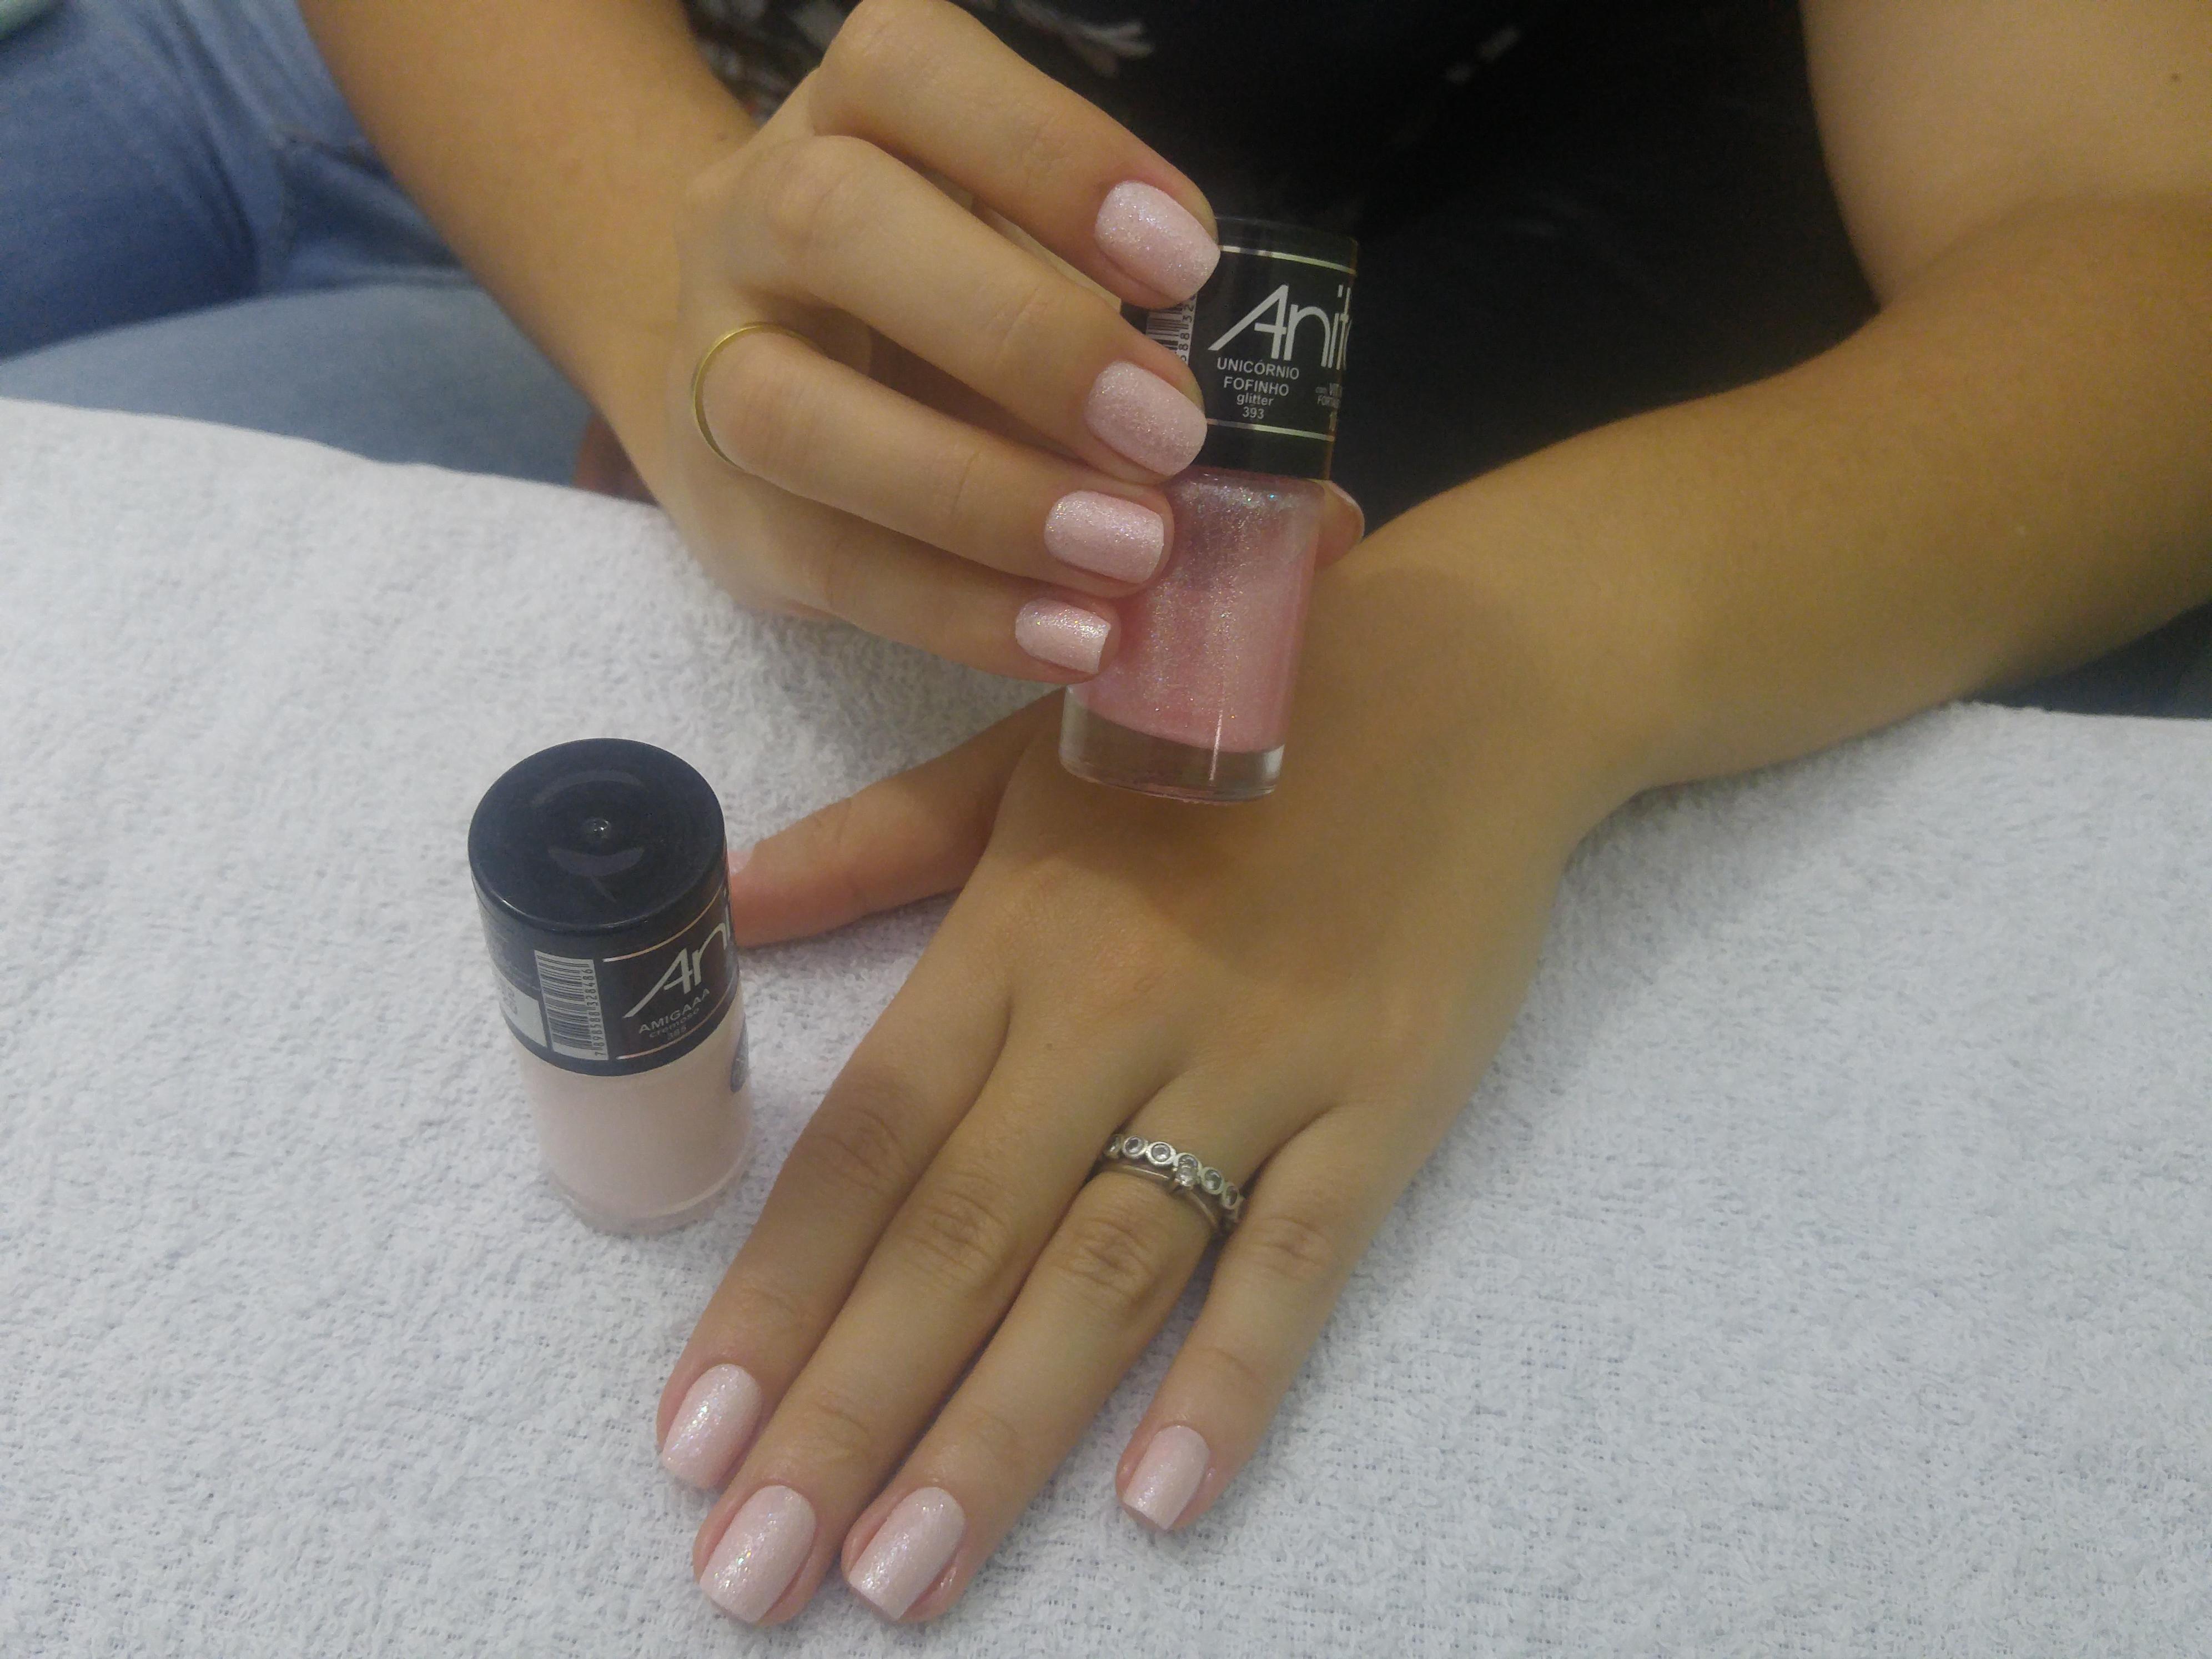 unha designer de sobrancelhas maquiador(a) manicure e pedicure